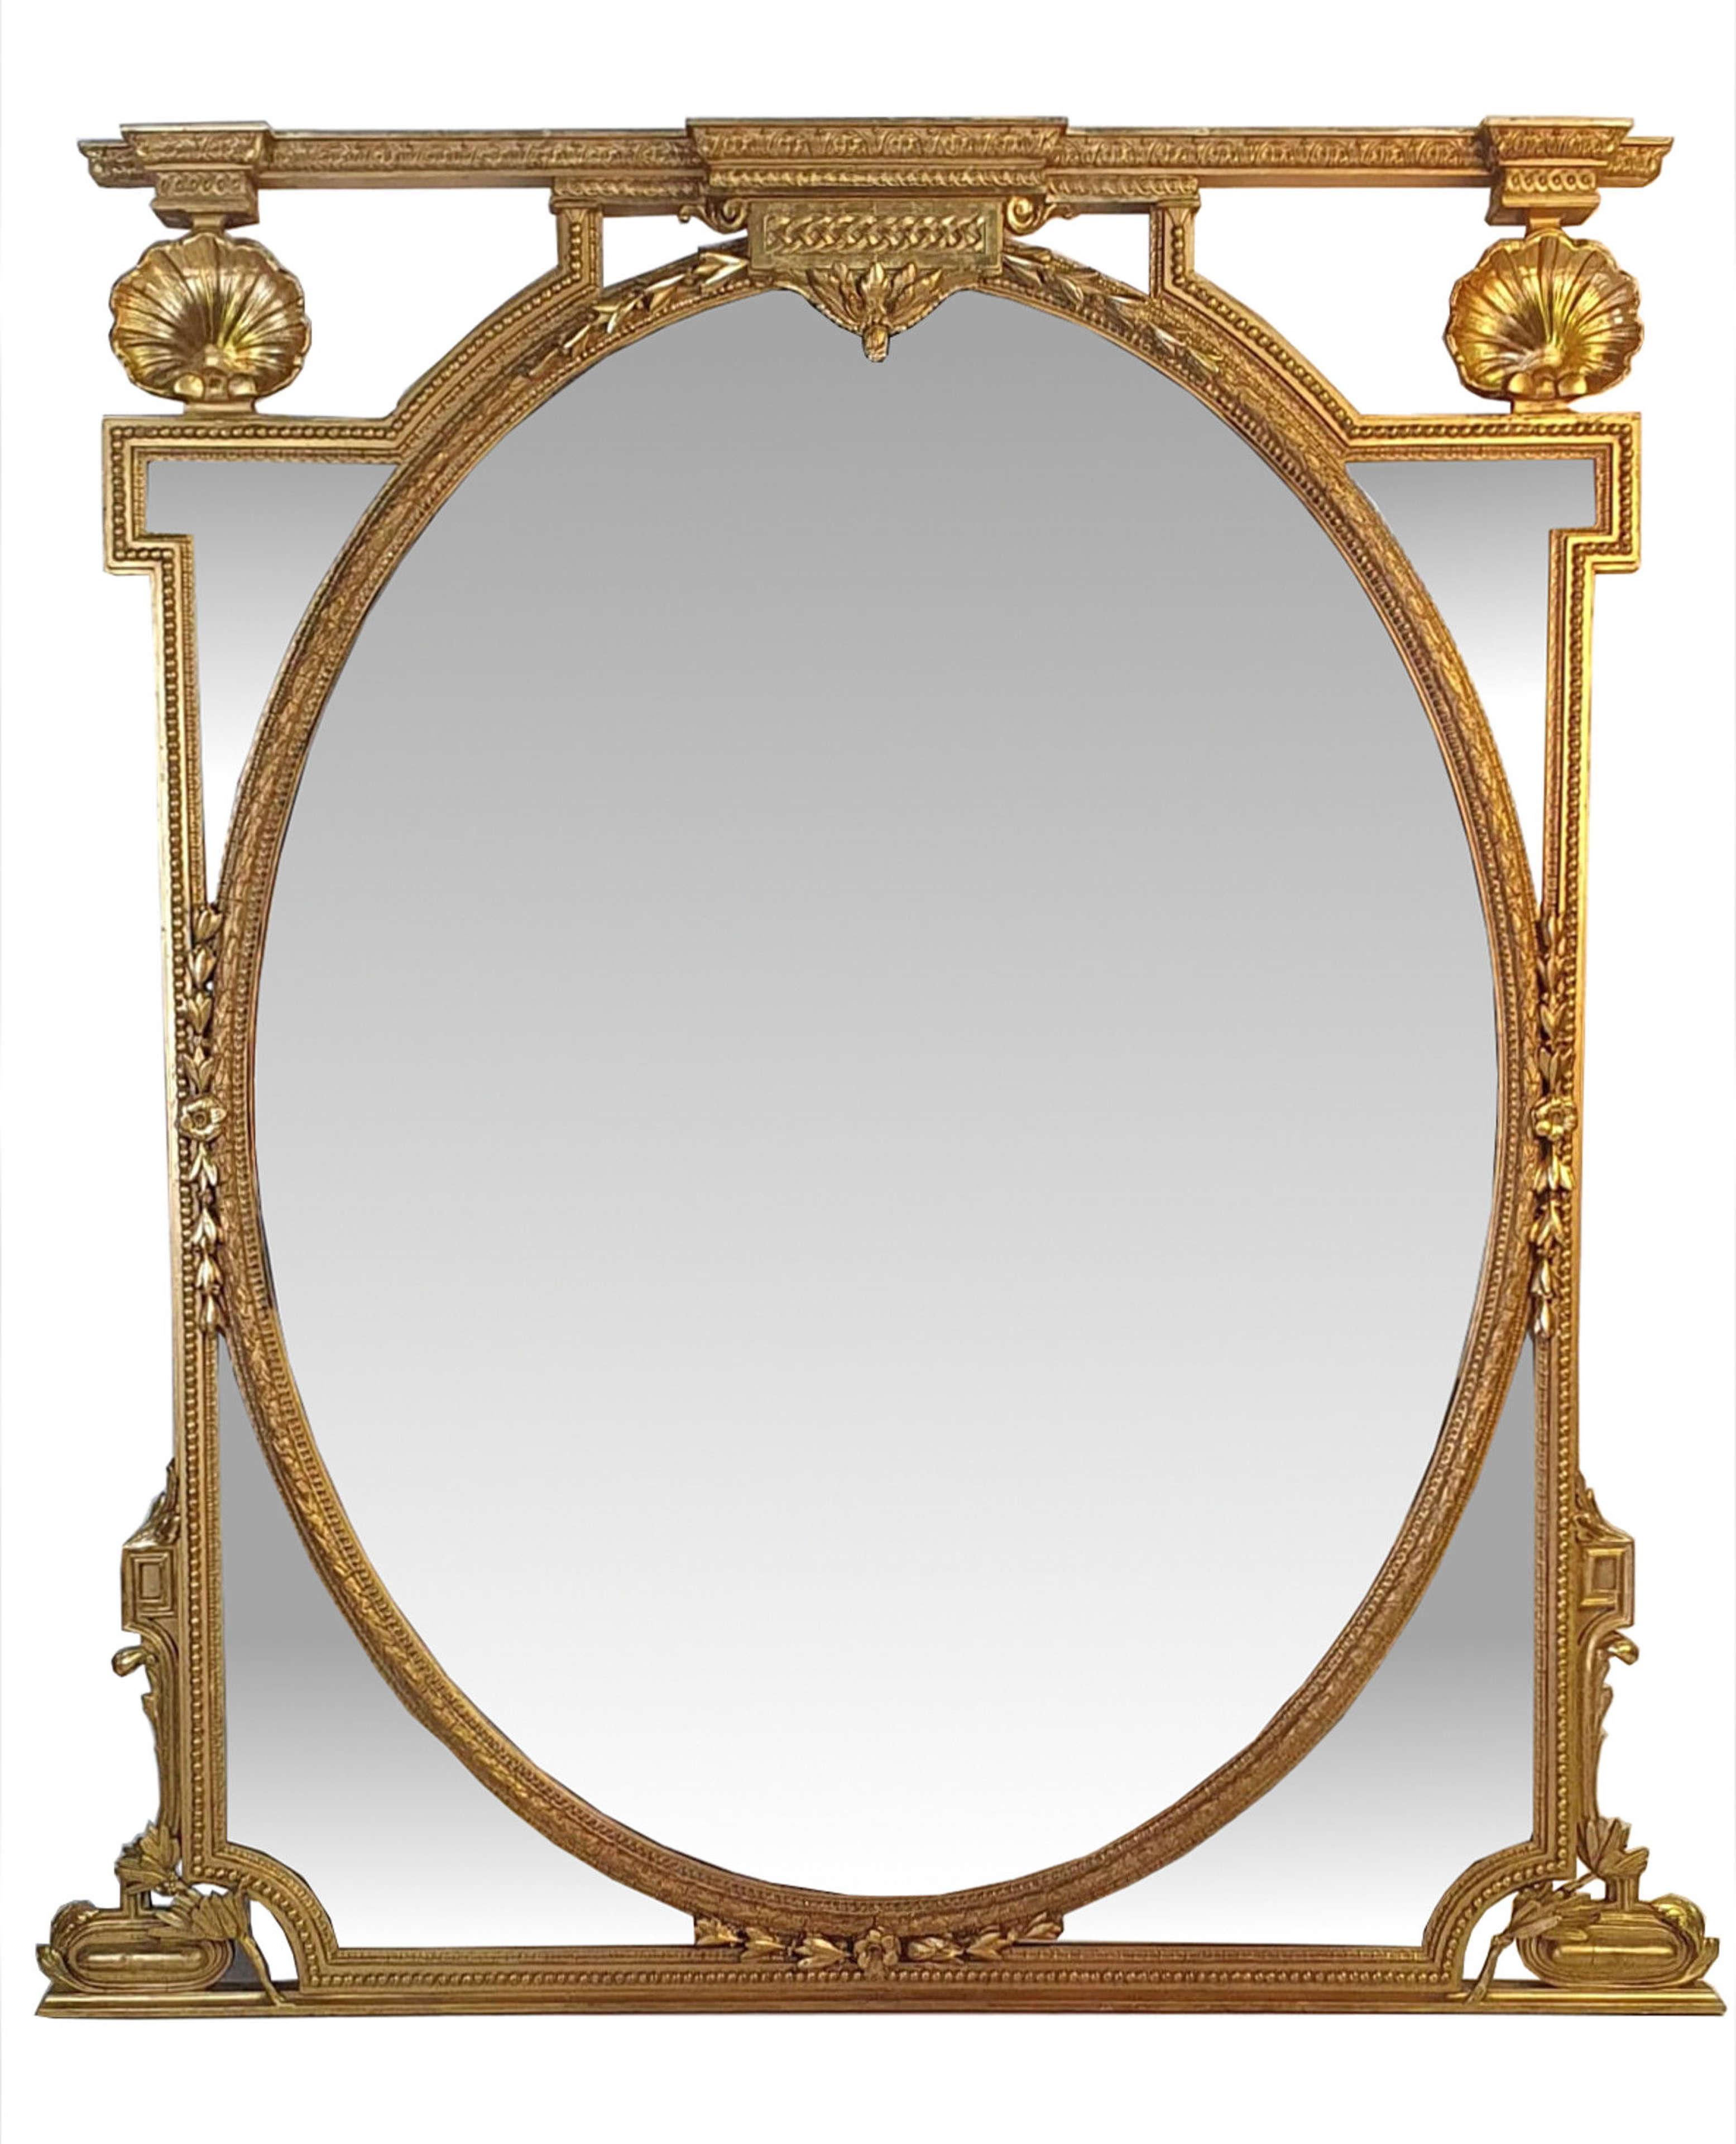 Very Large 19th Century Gilt Oval Mirror